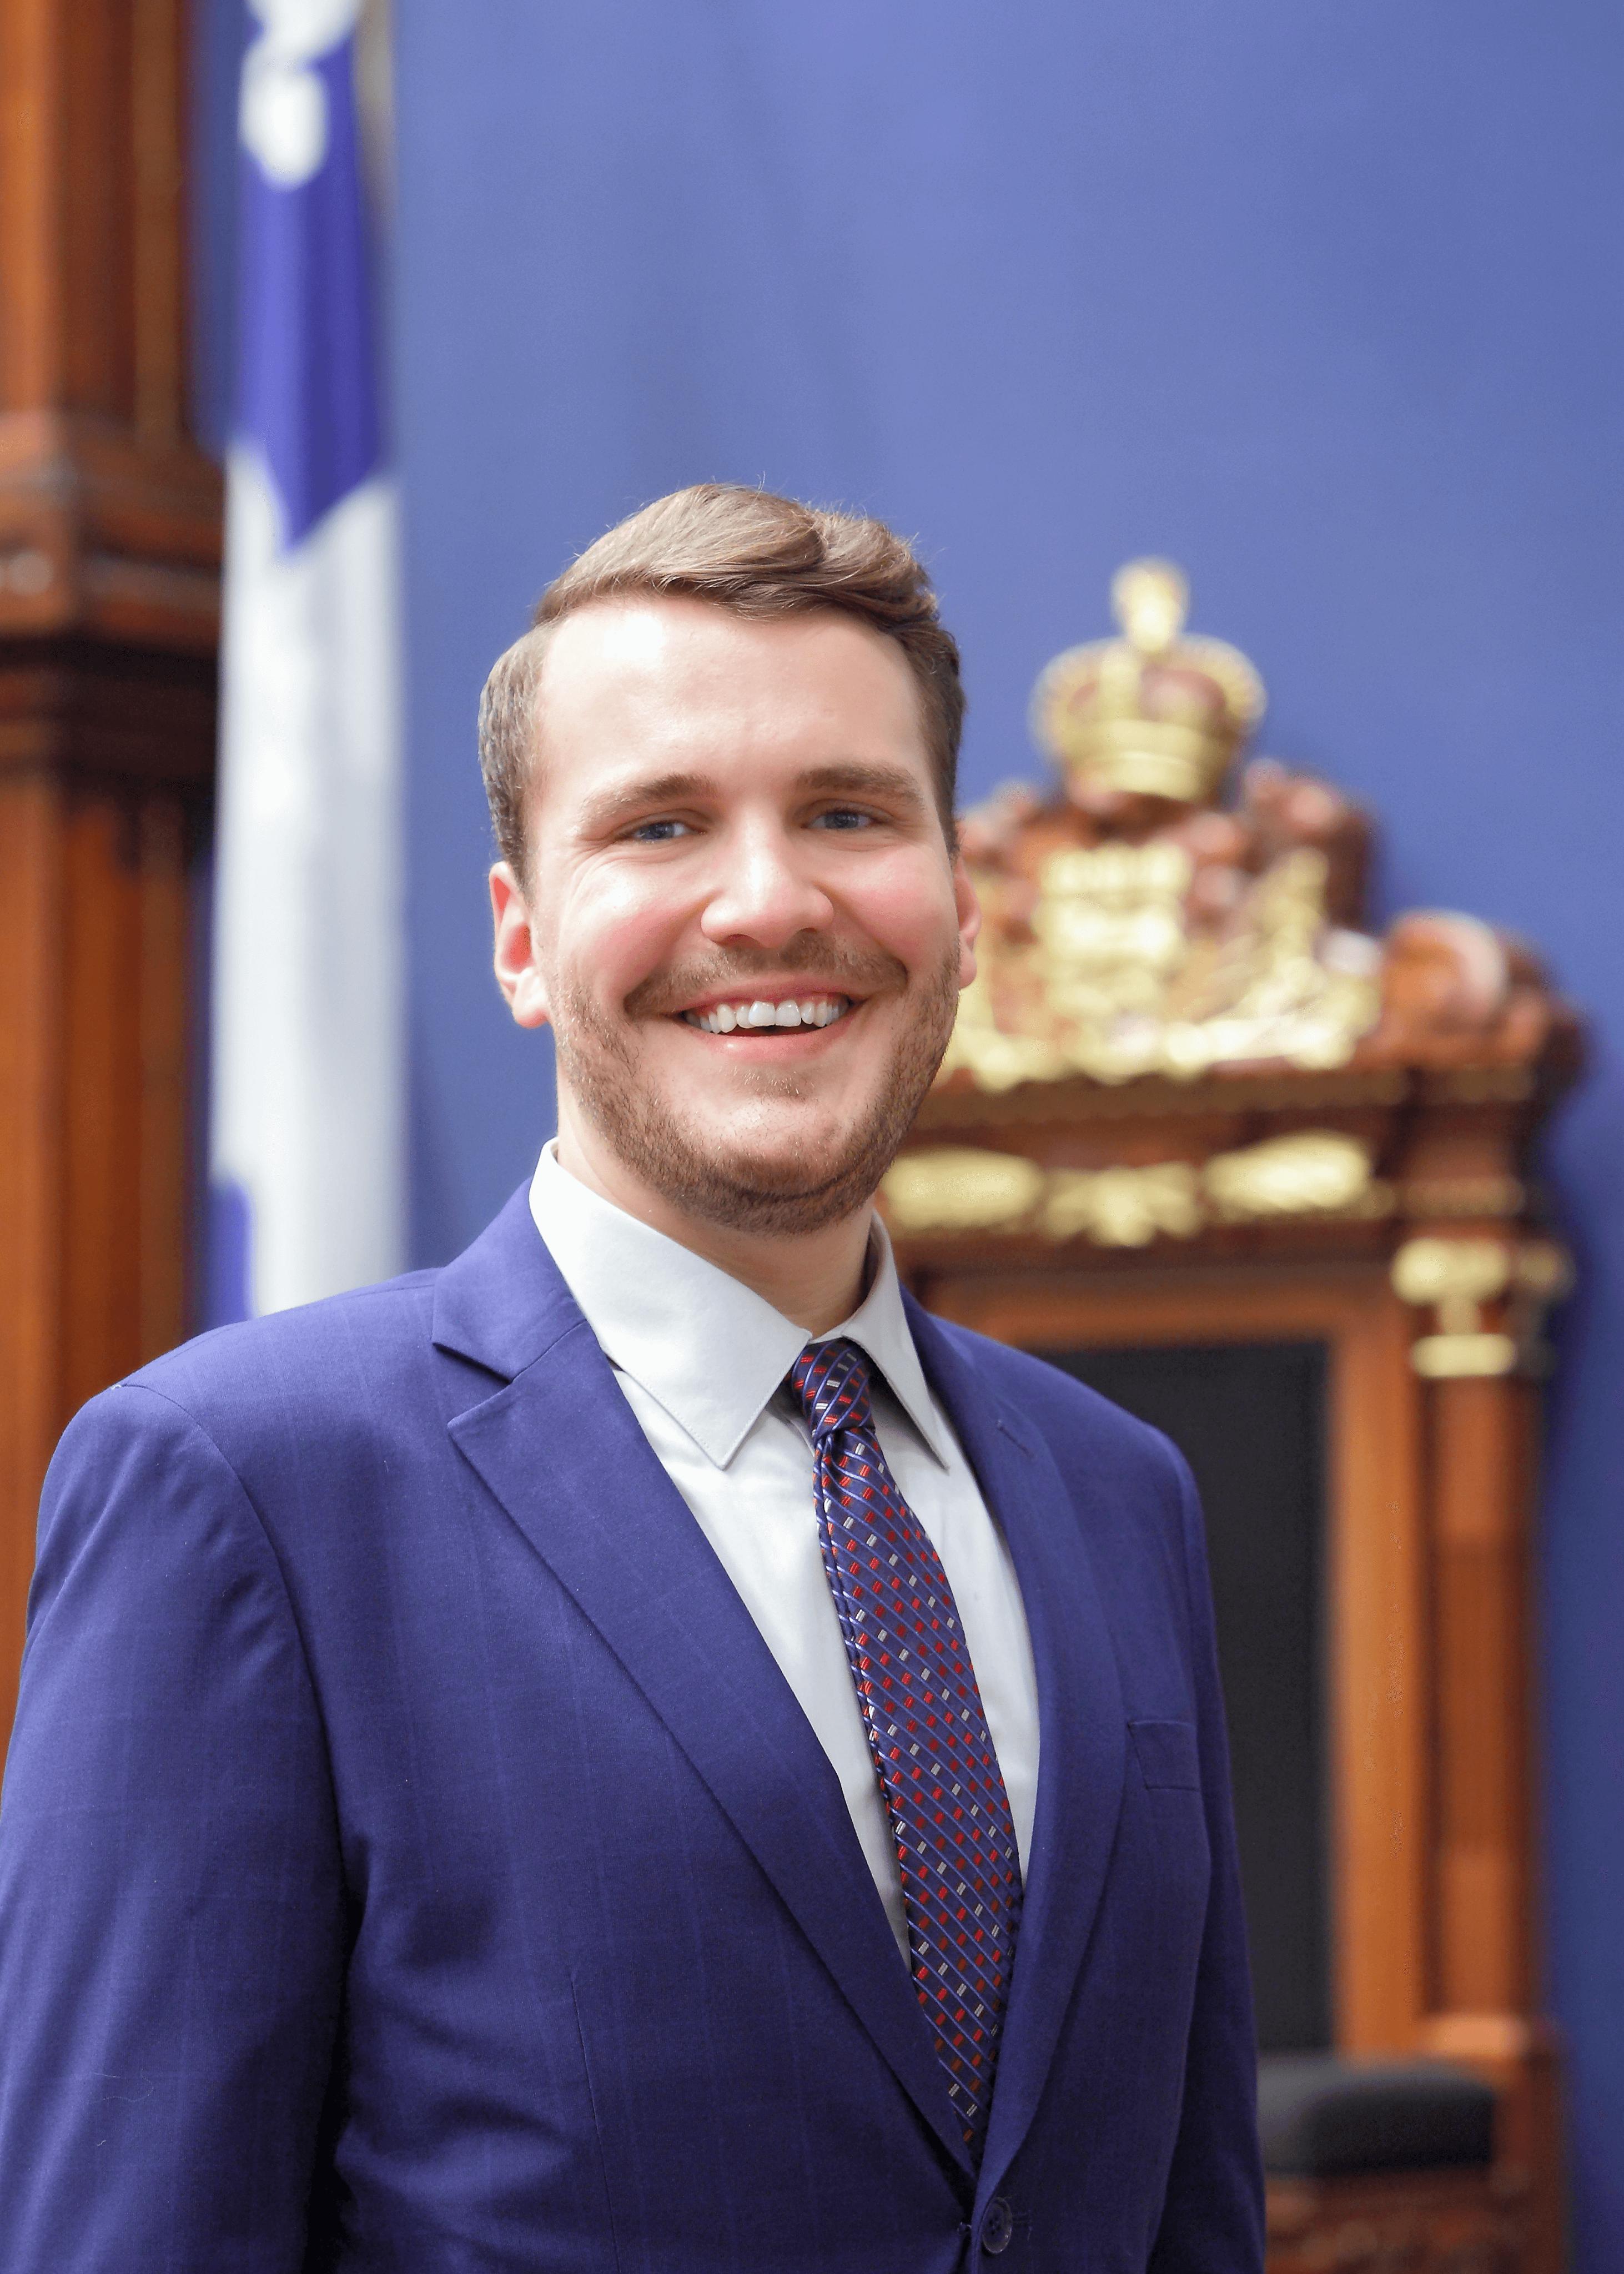 Benoît Bérubé